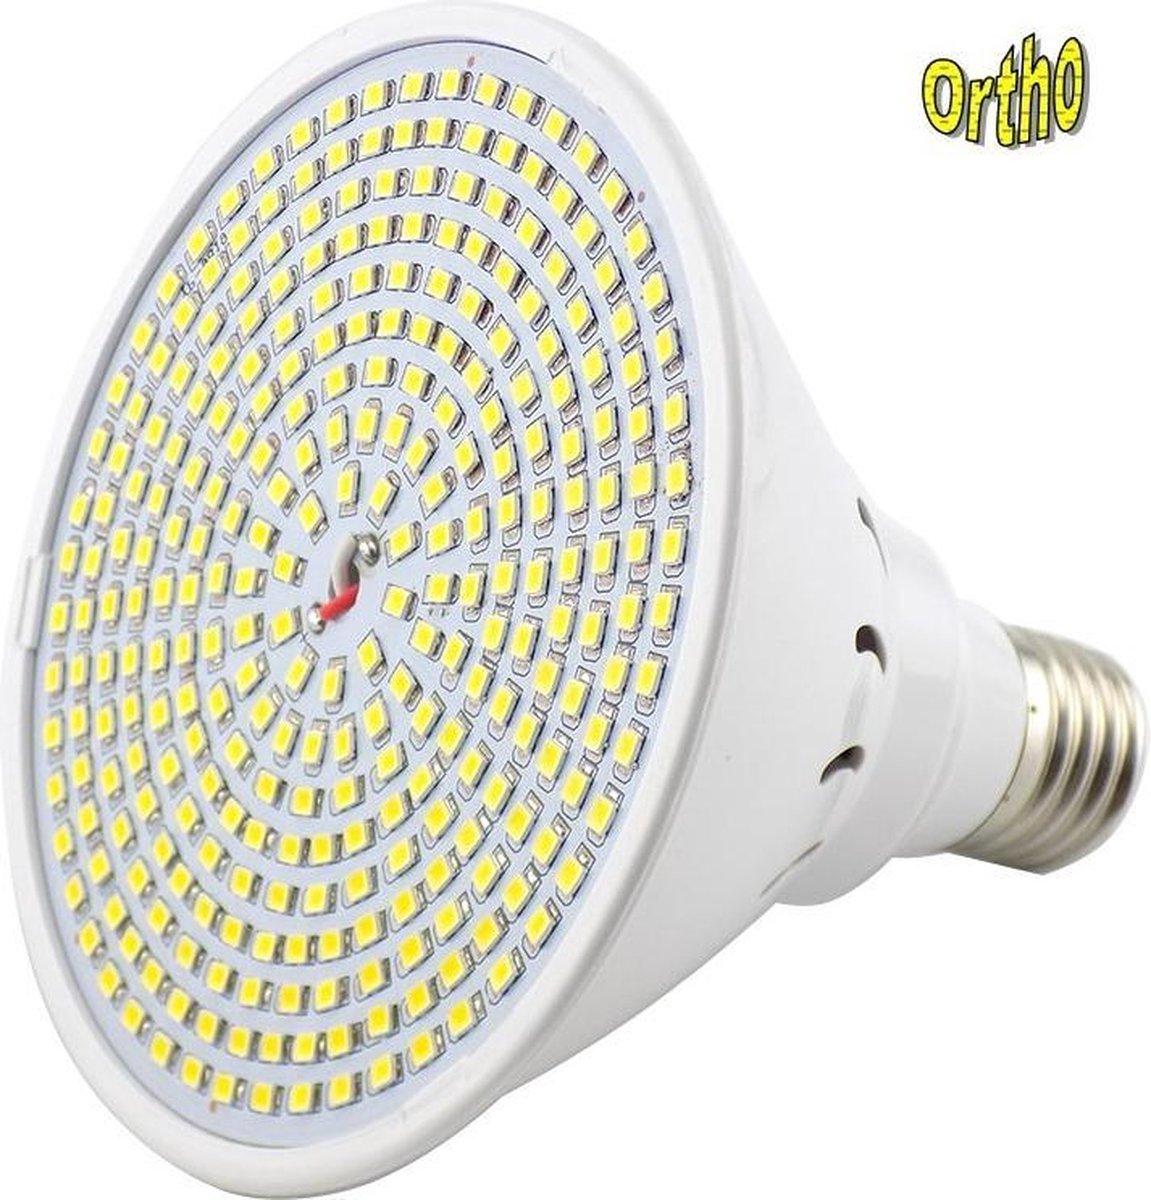 Ortho 290 LED WARM WIT licht Groeilamp **NIEUW** Bloeilamp Kweeklamp Grow light groei lamp